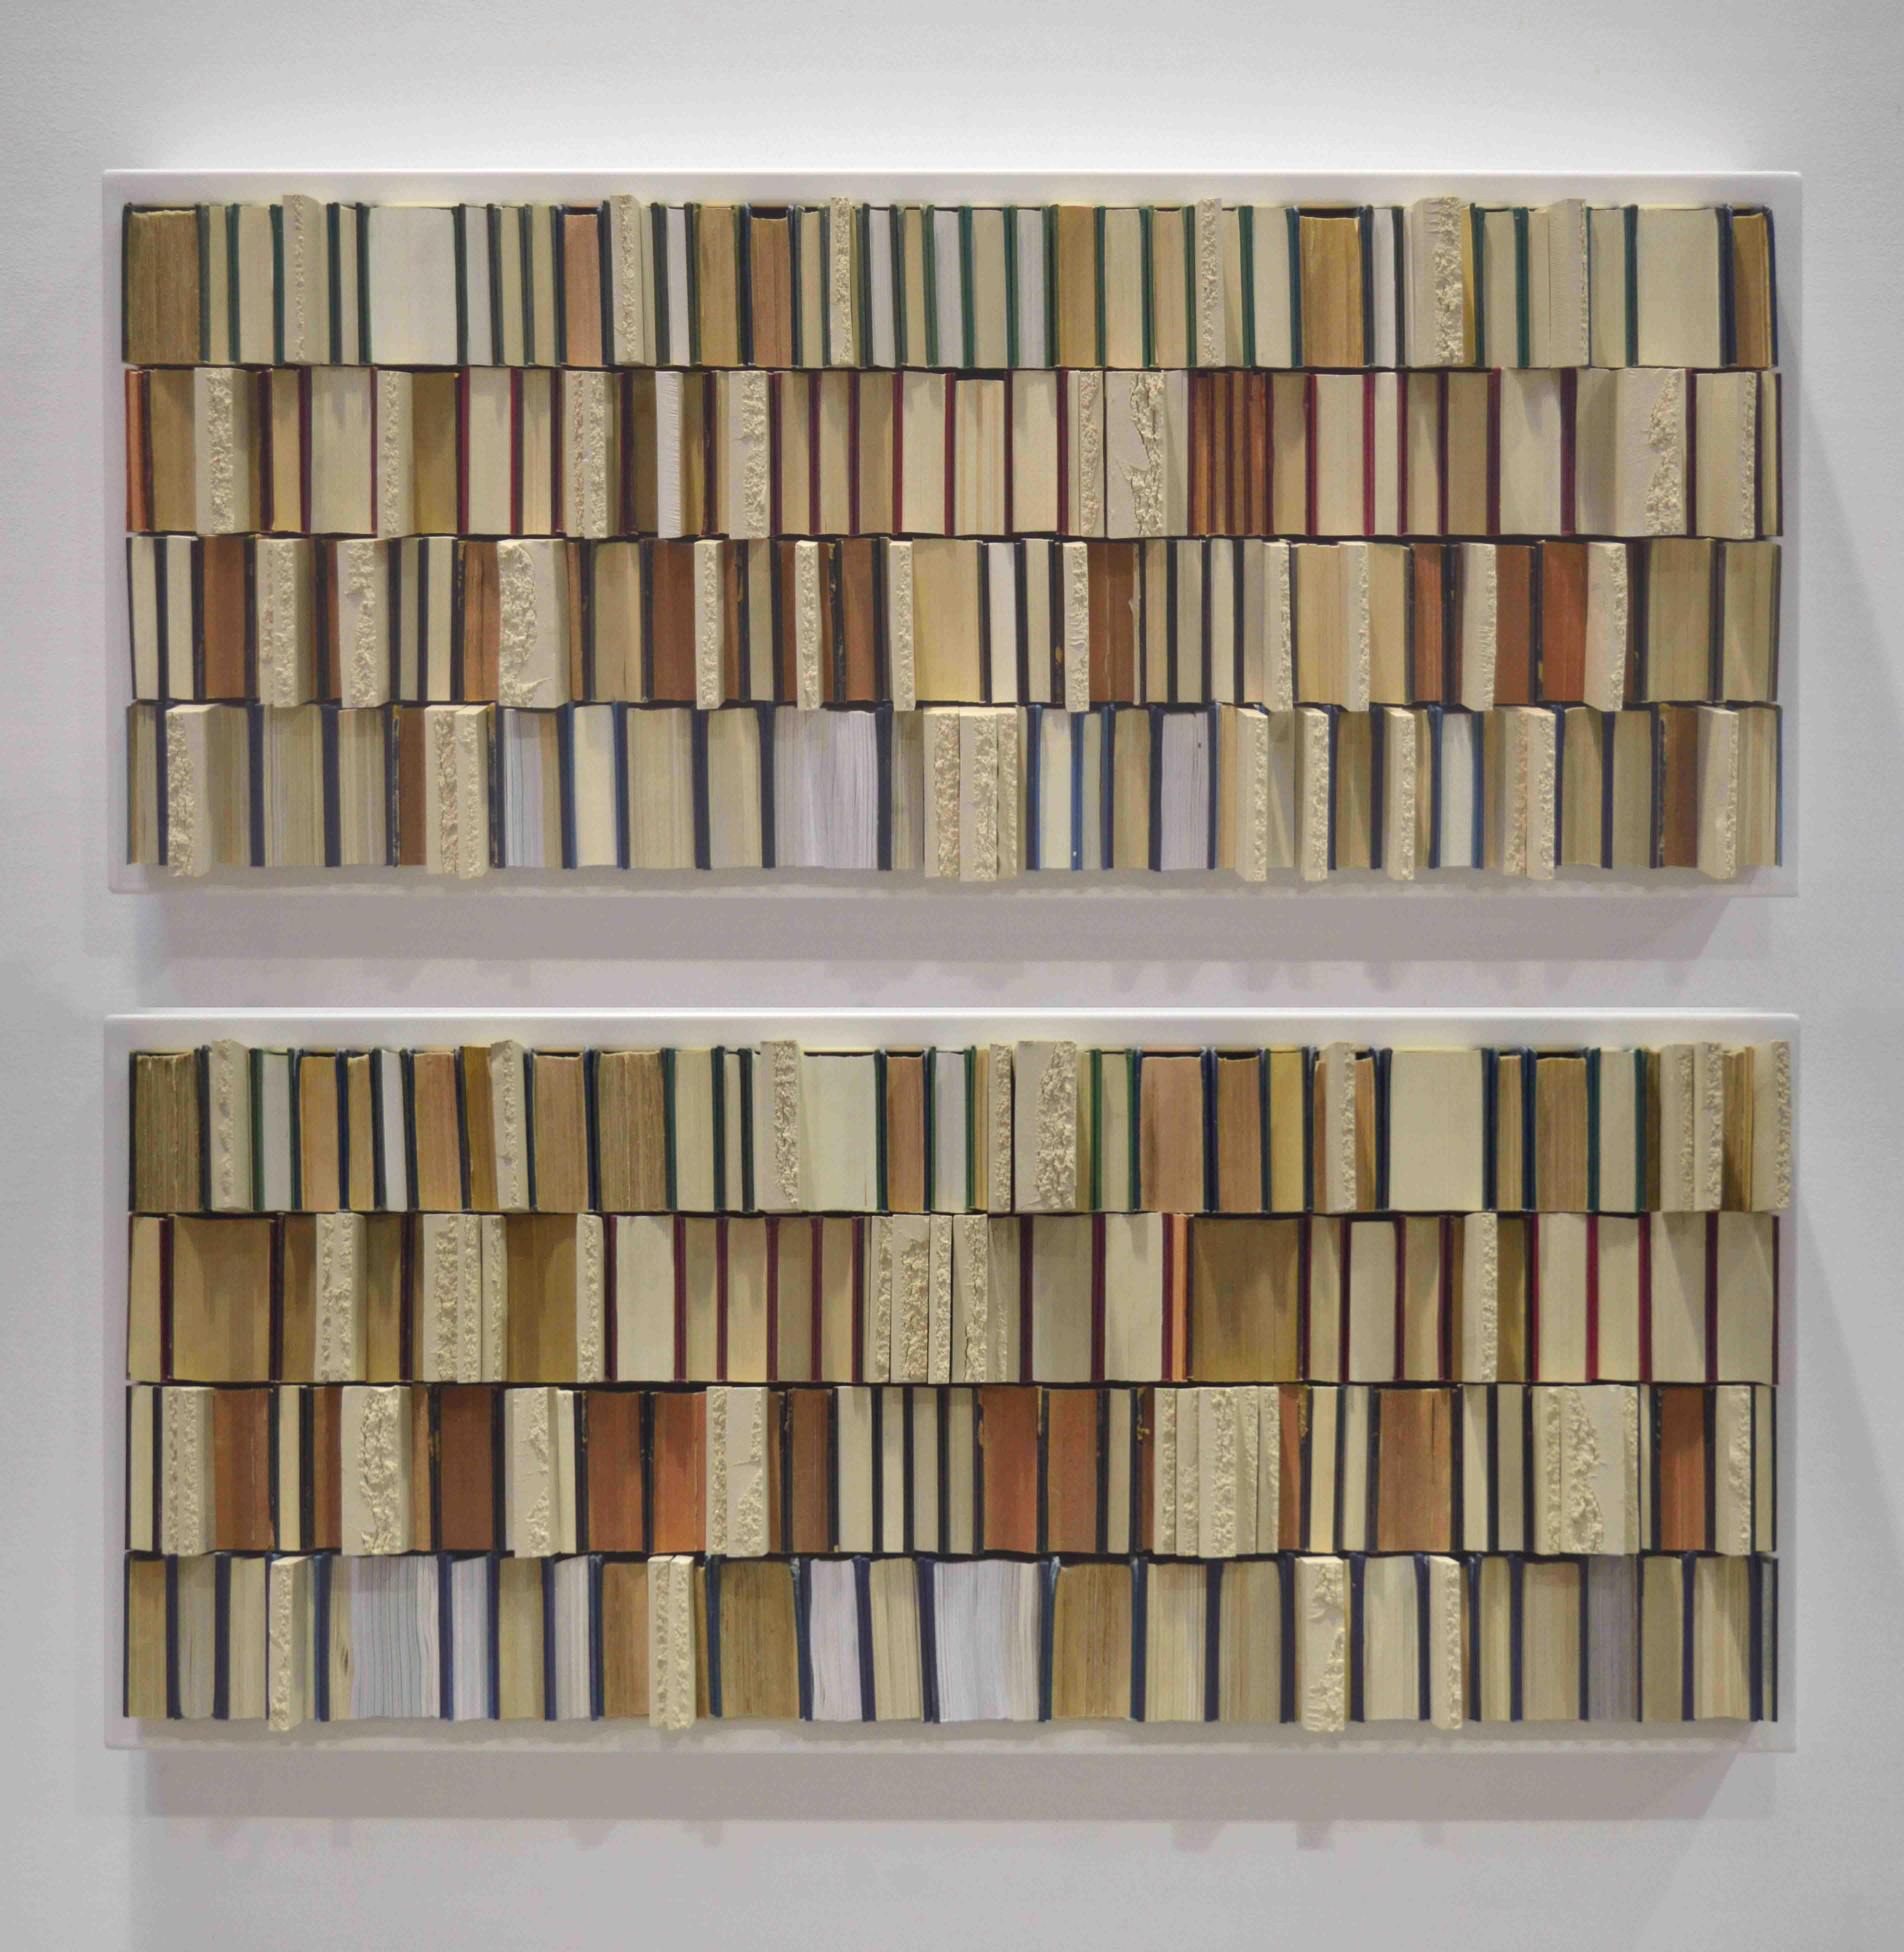 New Art Centre - Jacob Van Der Beugel